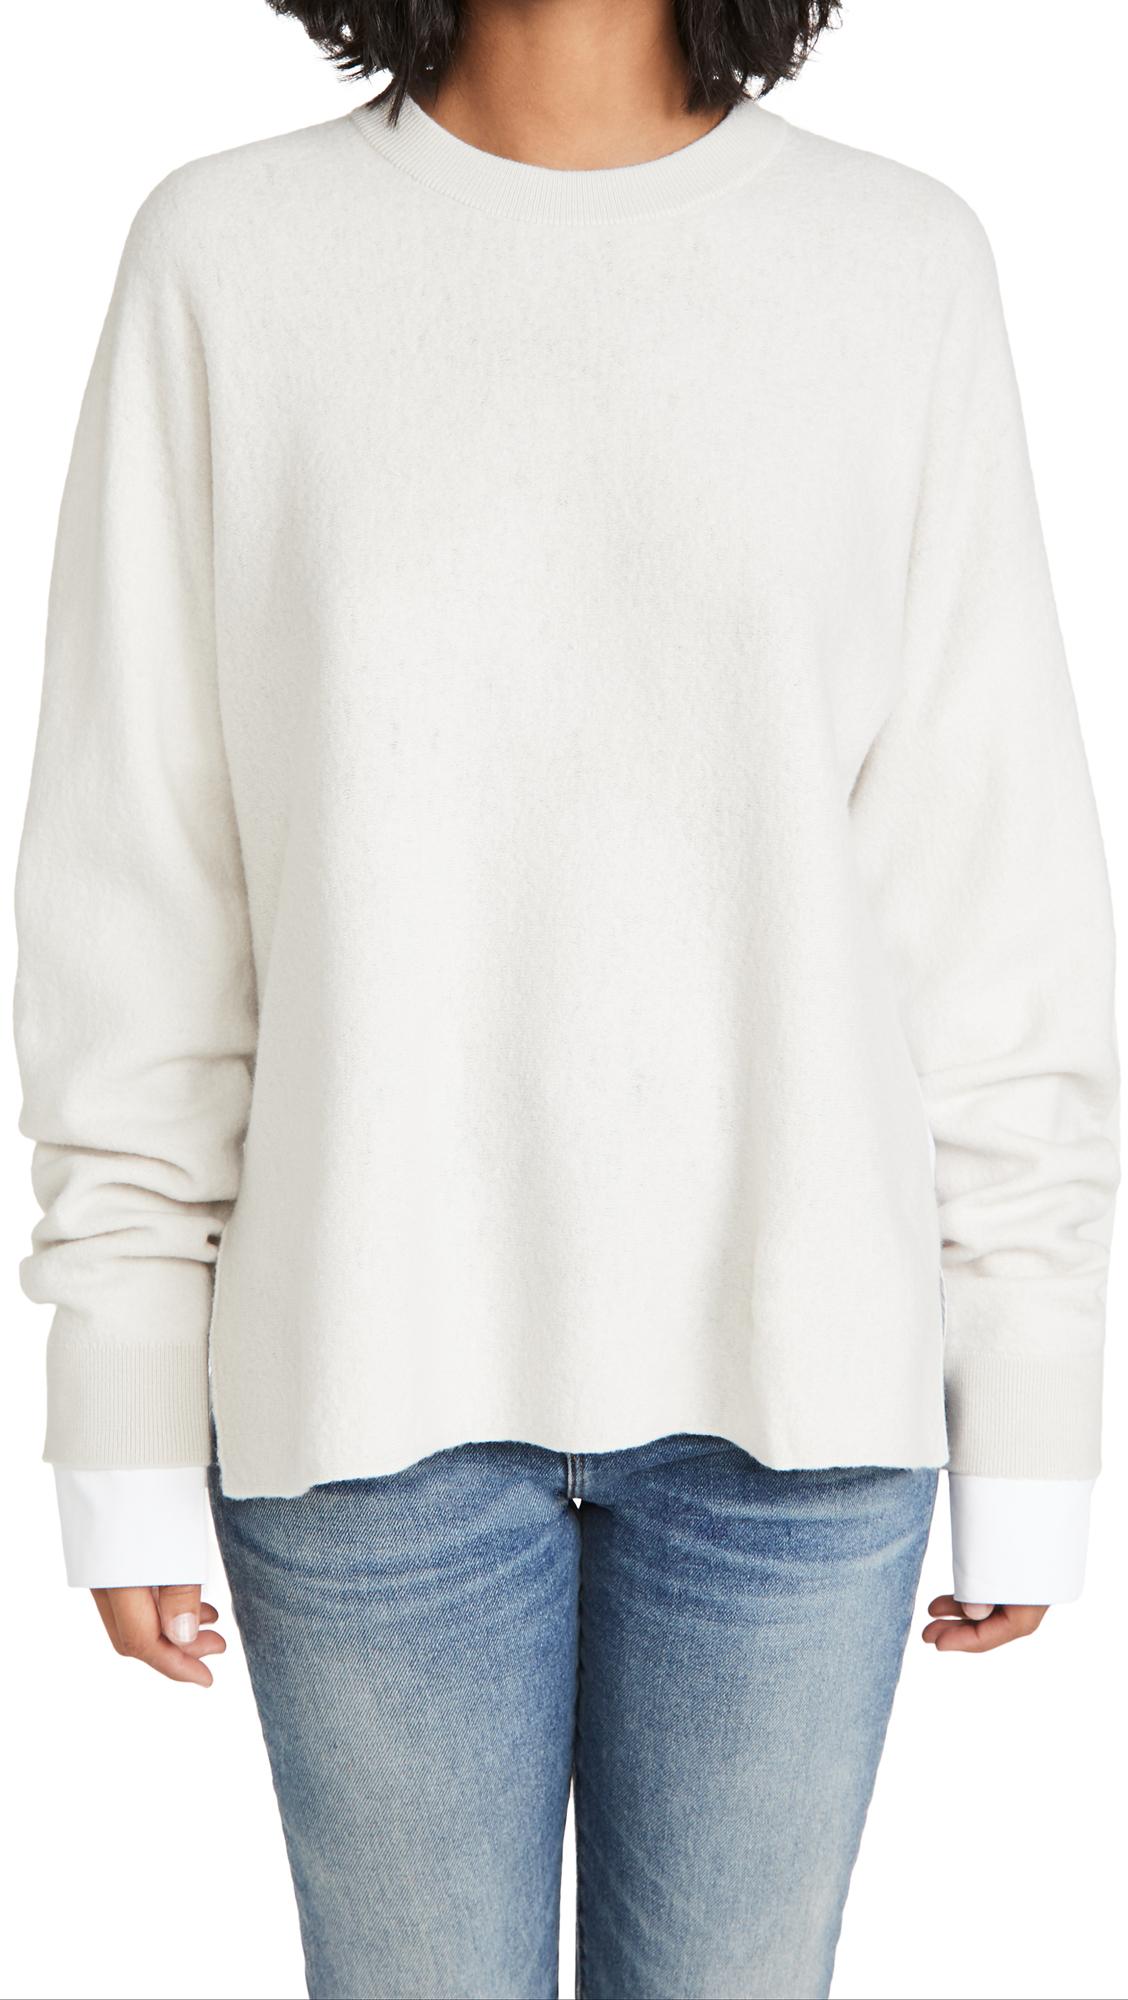 Tibi Combo Sweater